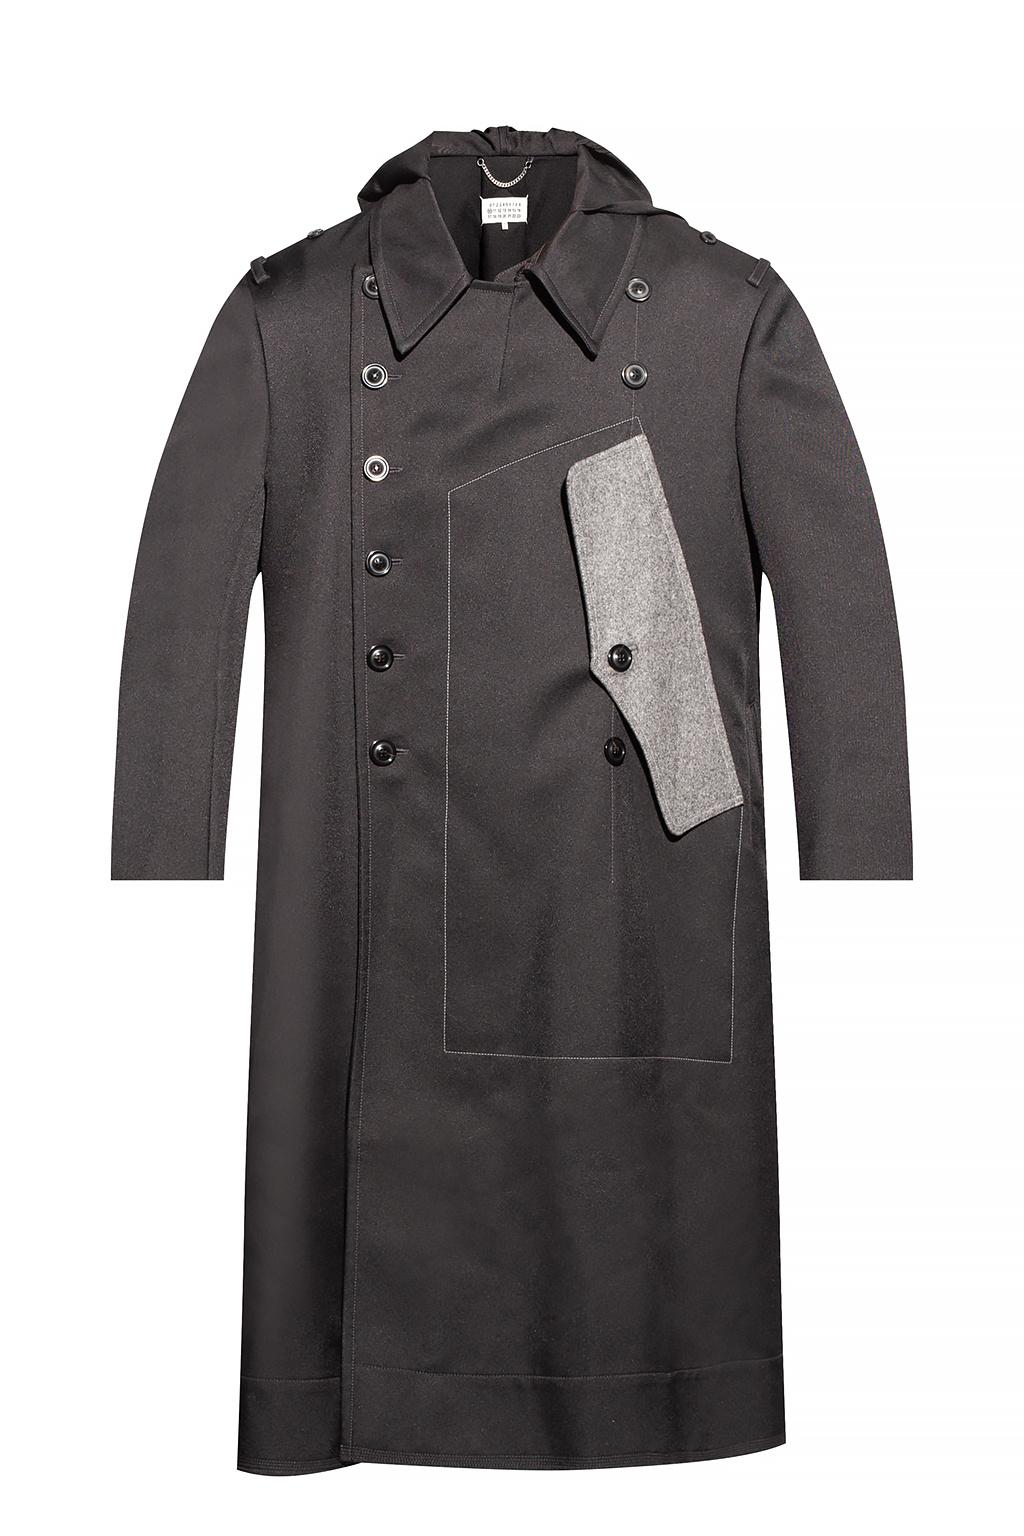 Maison Margiela Wool coat